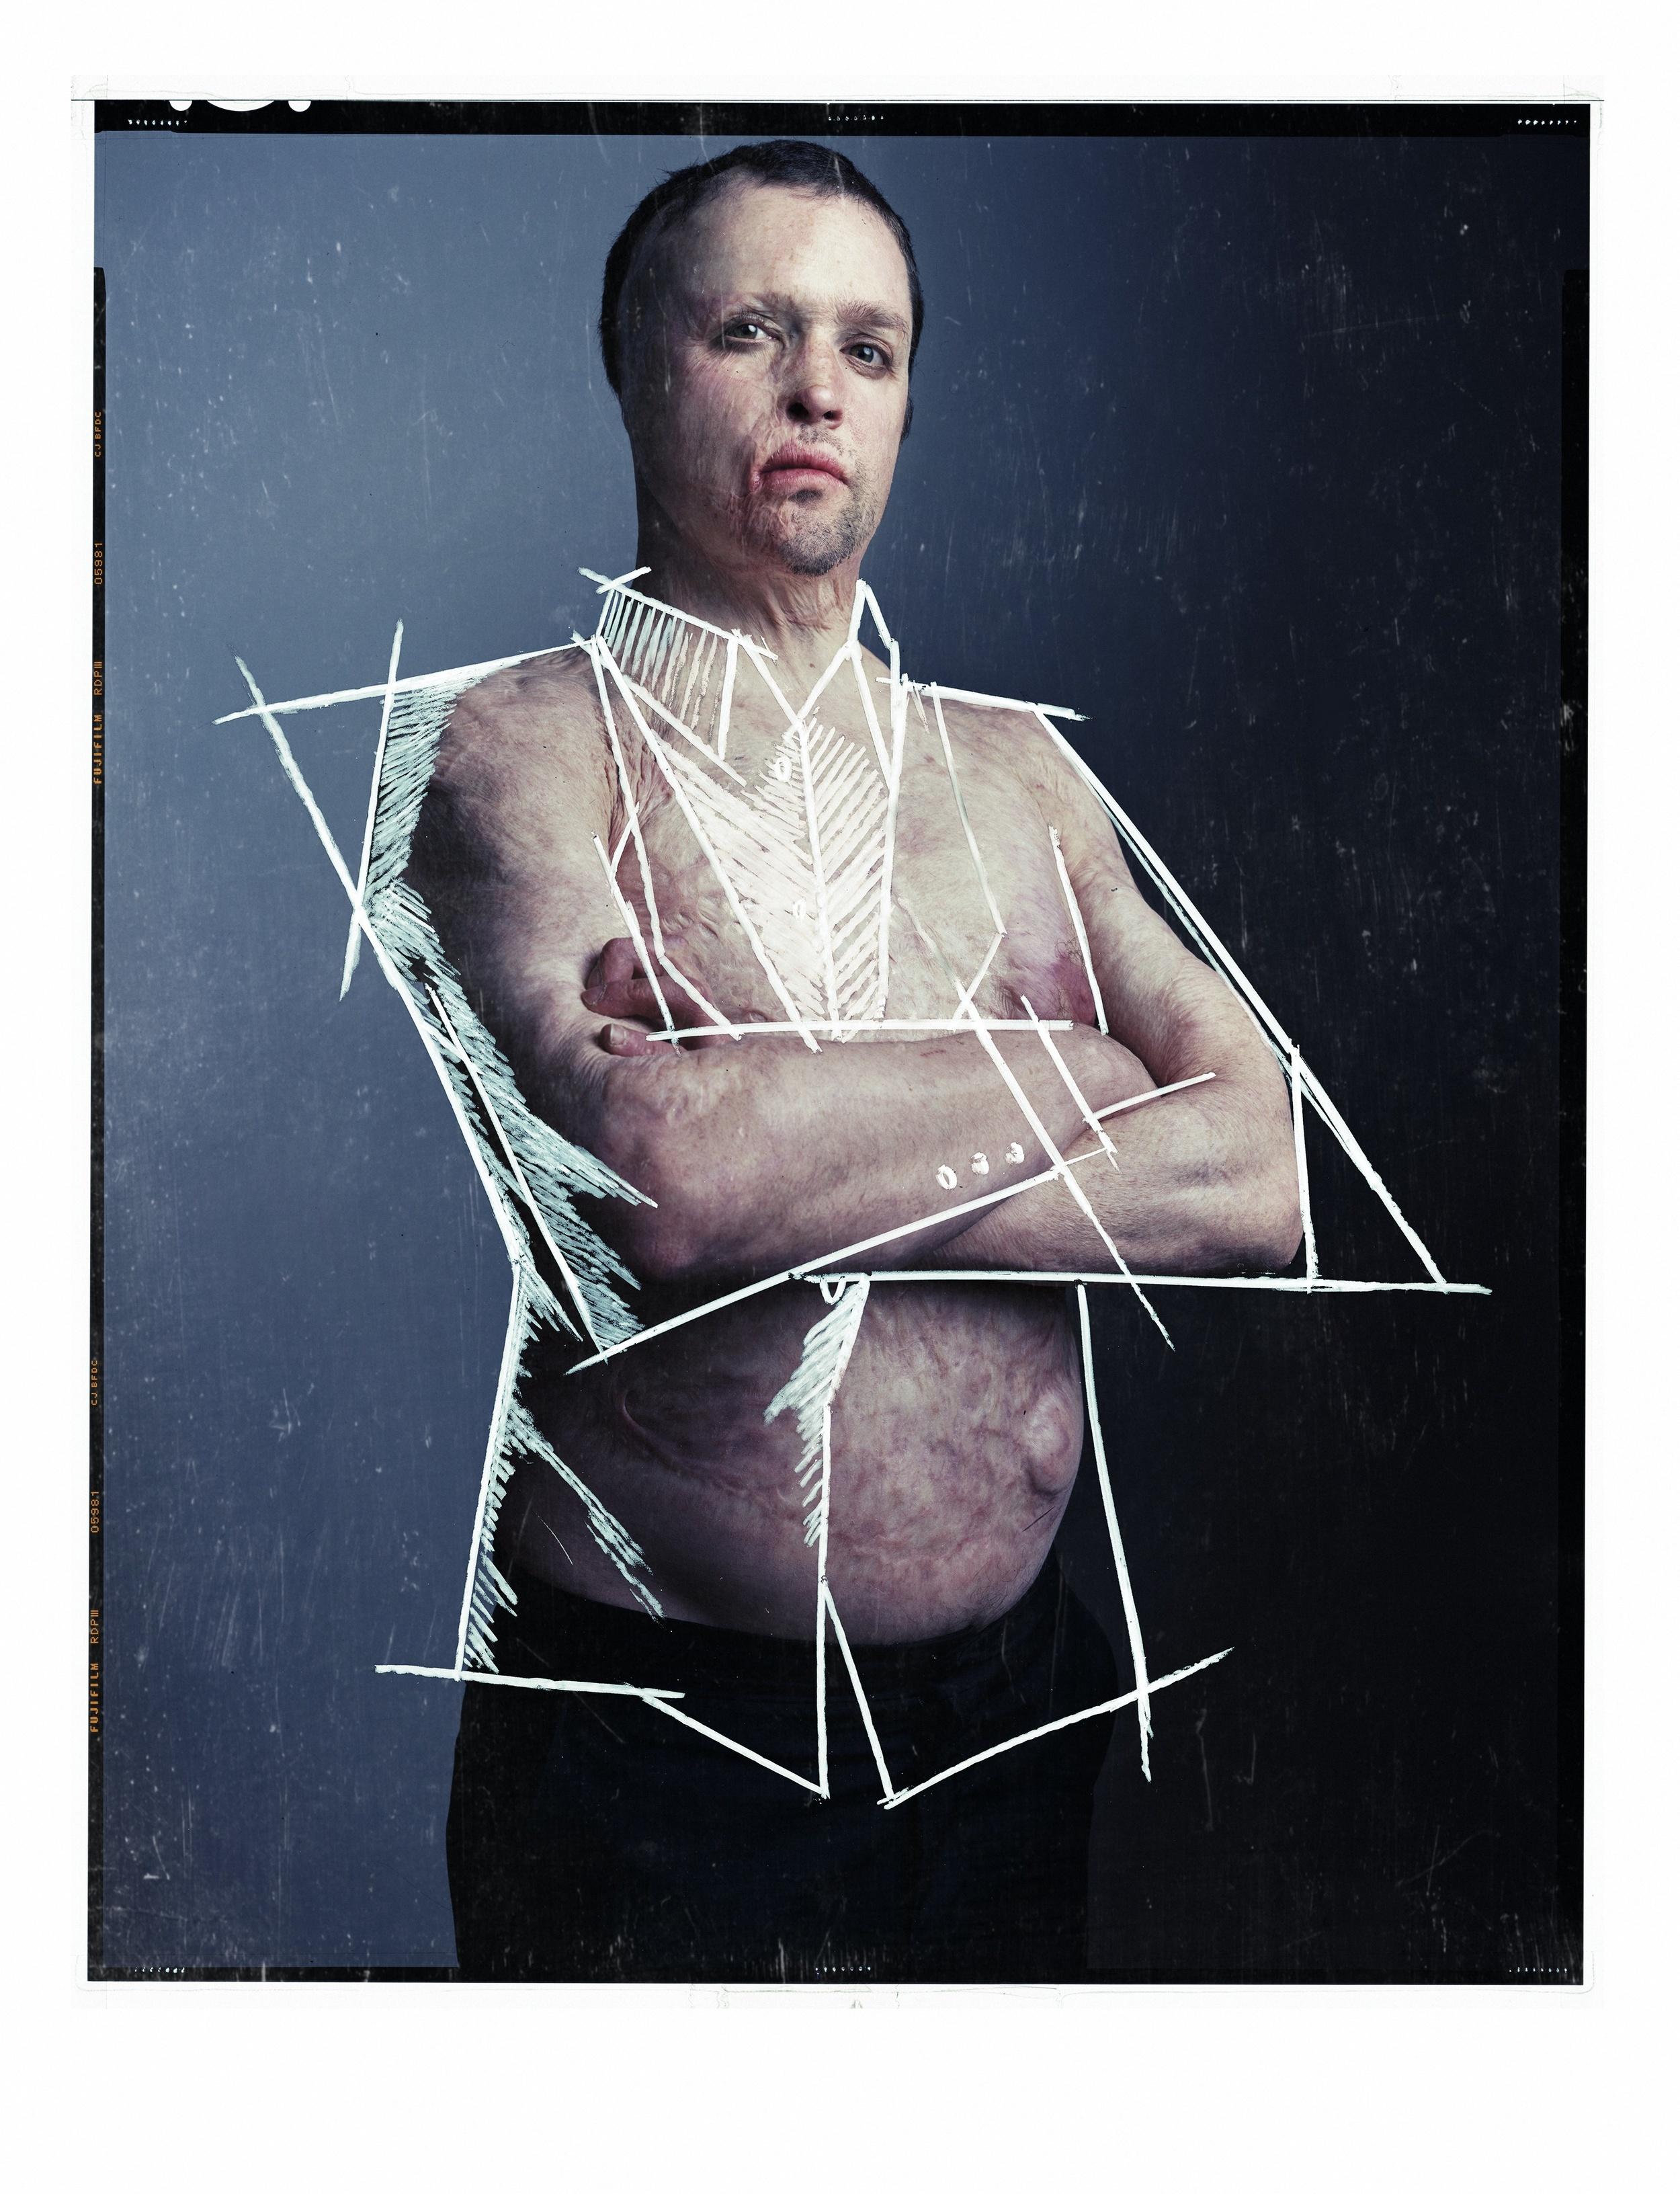 Ben   Deutsch Magazine    MODEL:Ben Mathis    STYLING:Anatolli Smith    MAKEUP:Lucie Nguyen    DRAWING ON LAST PHOTO:Ben Mathis